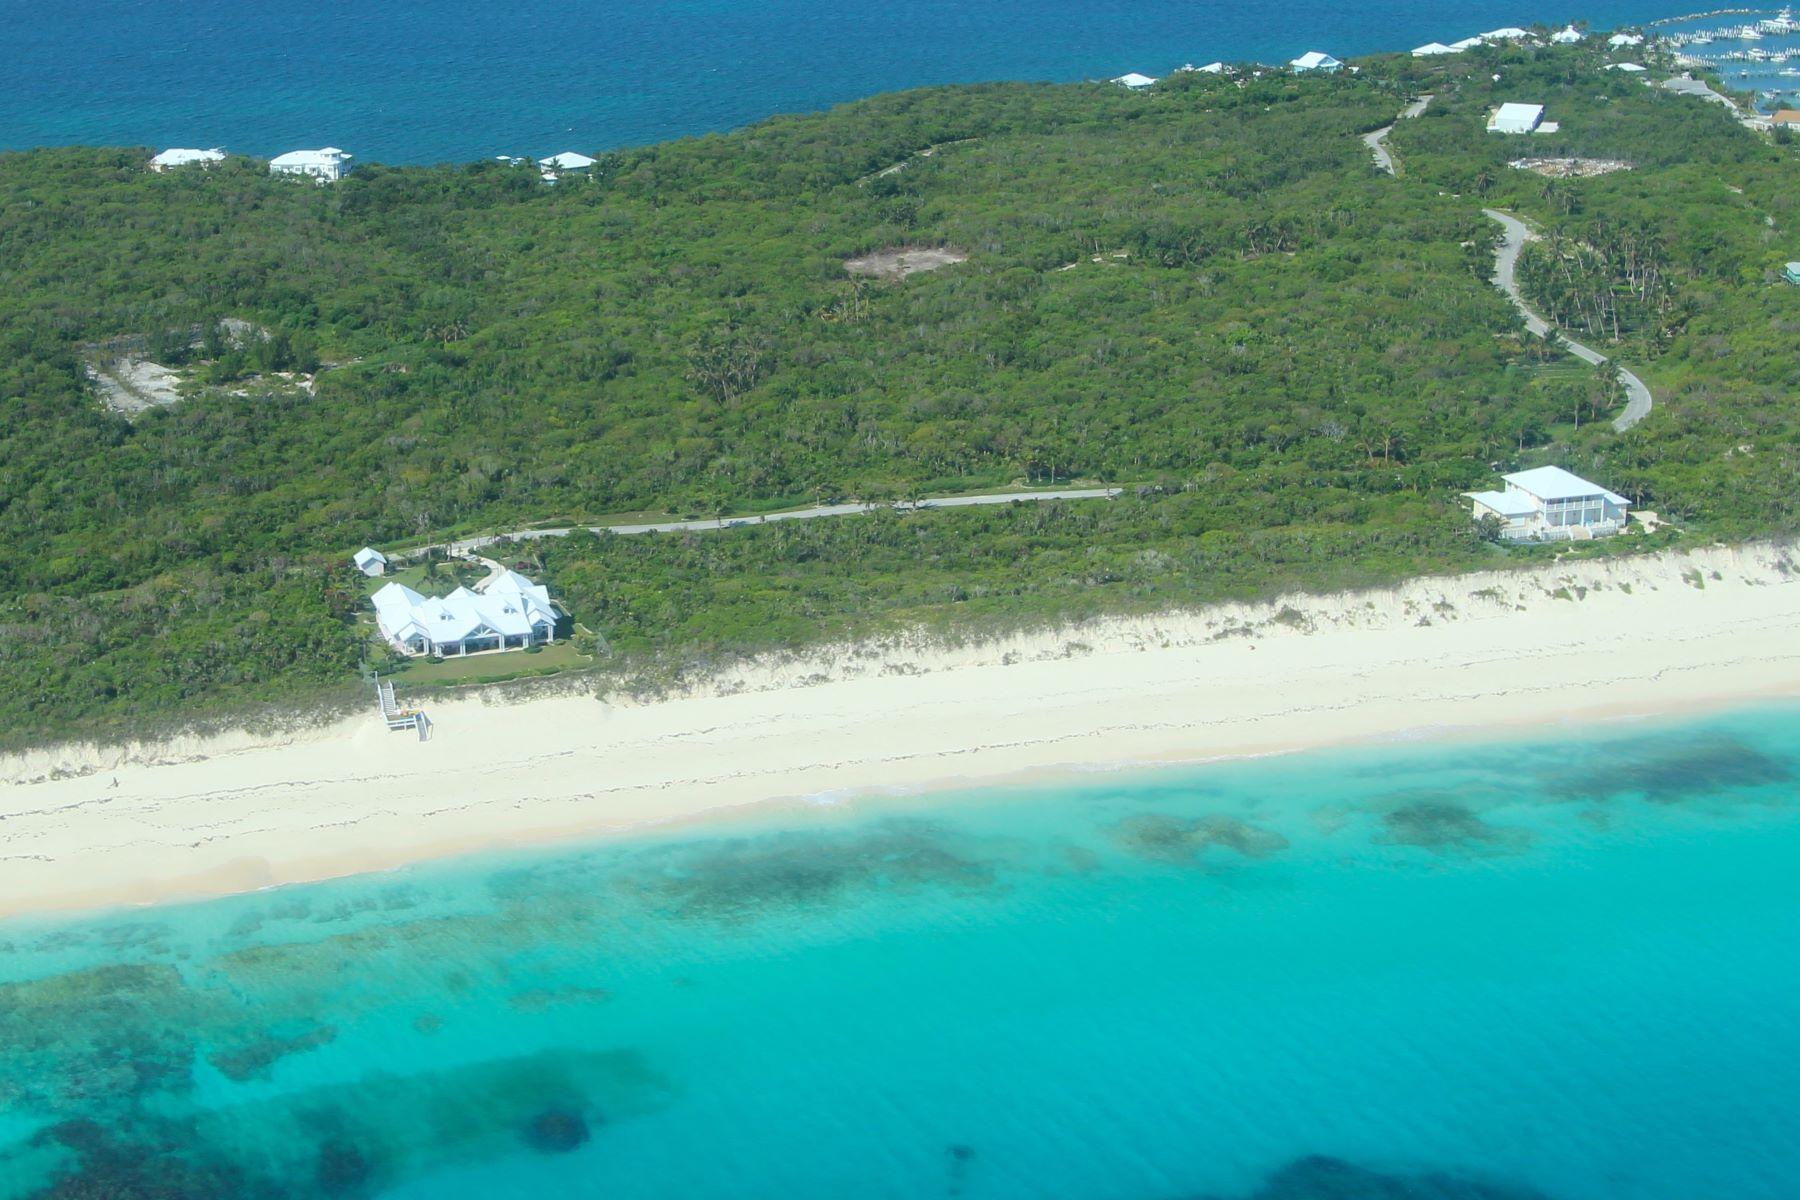 Tài Sản Bán Guana Cay